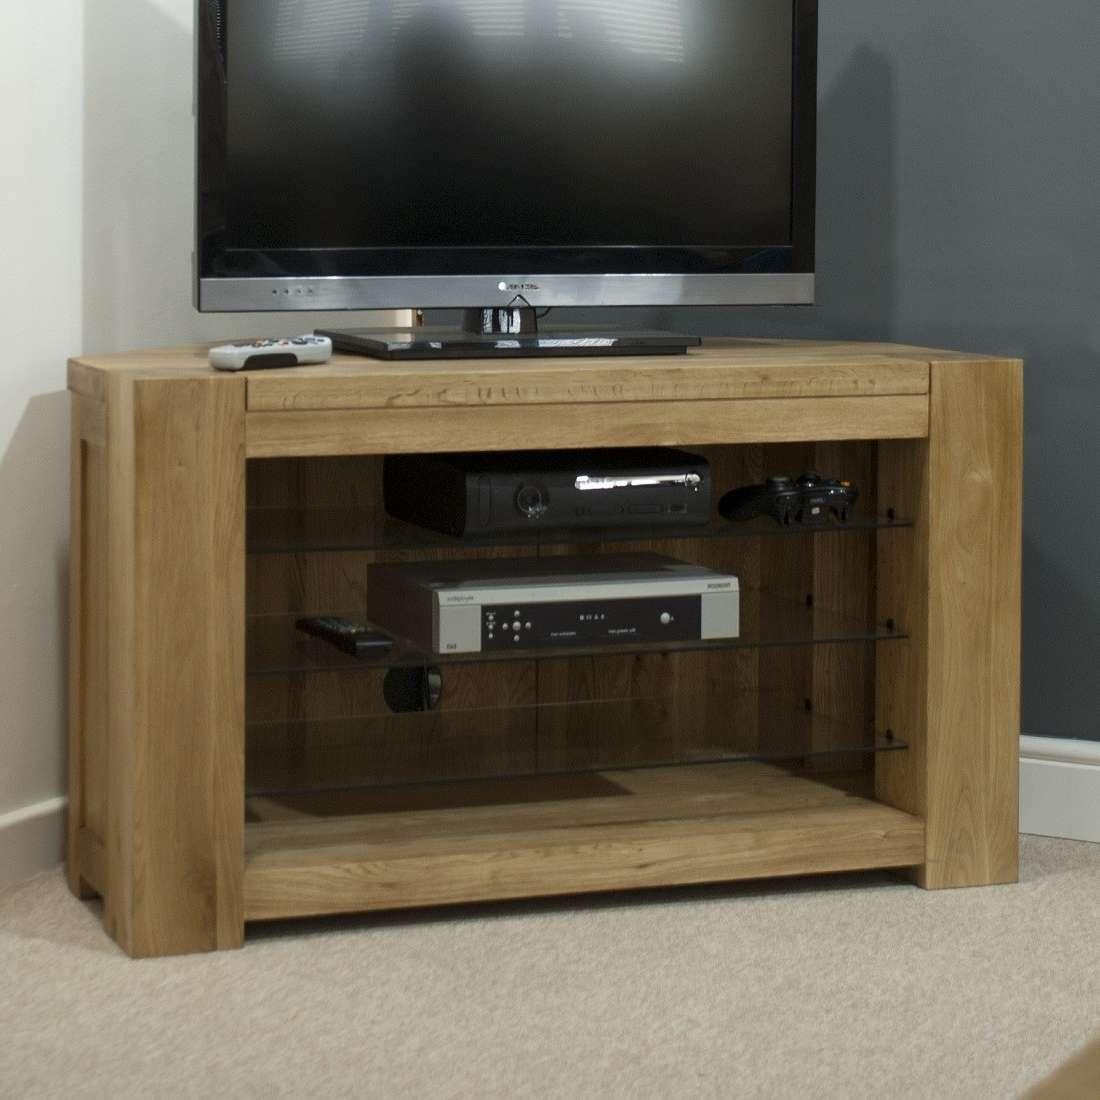 Trend Solid Oak Corner Tv Unit | Oak Furniture Uk Within Solid Oak Tv Cabinets (View 3 of 20)